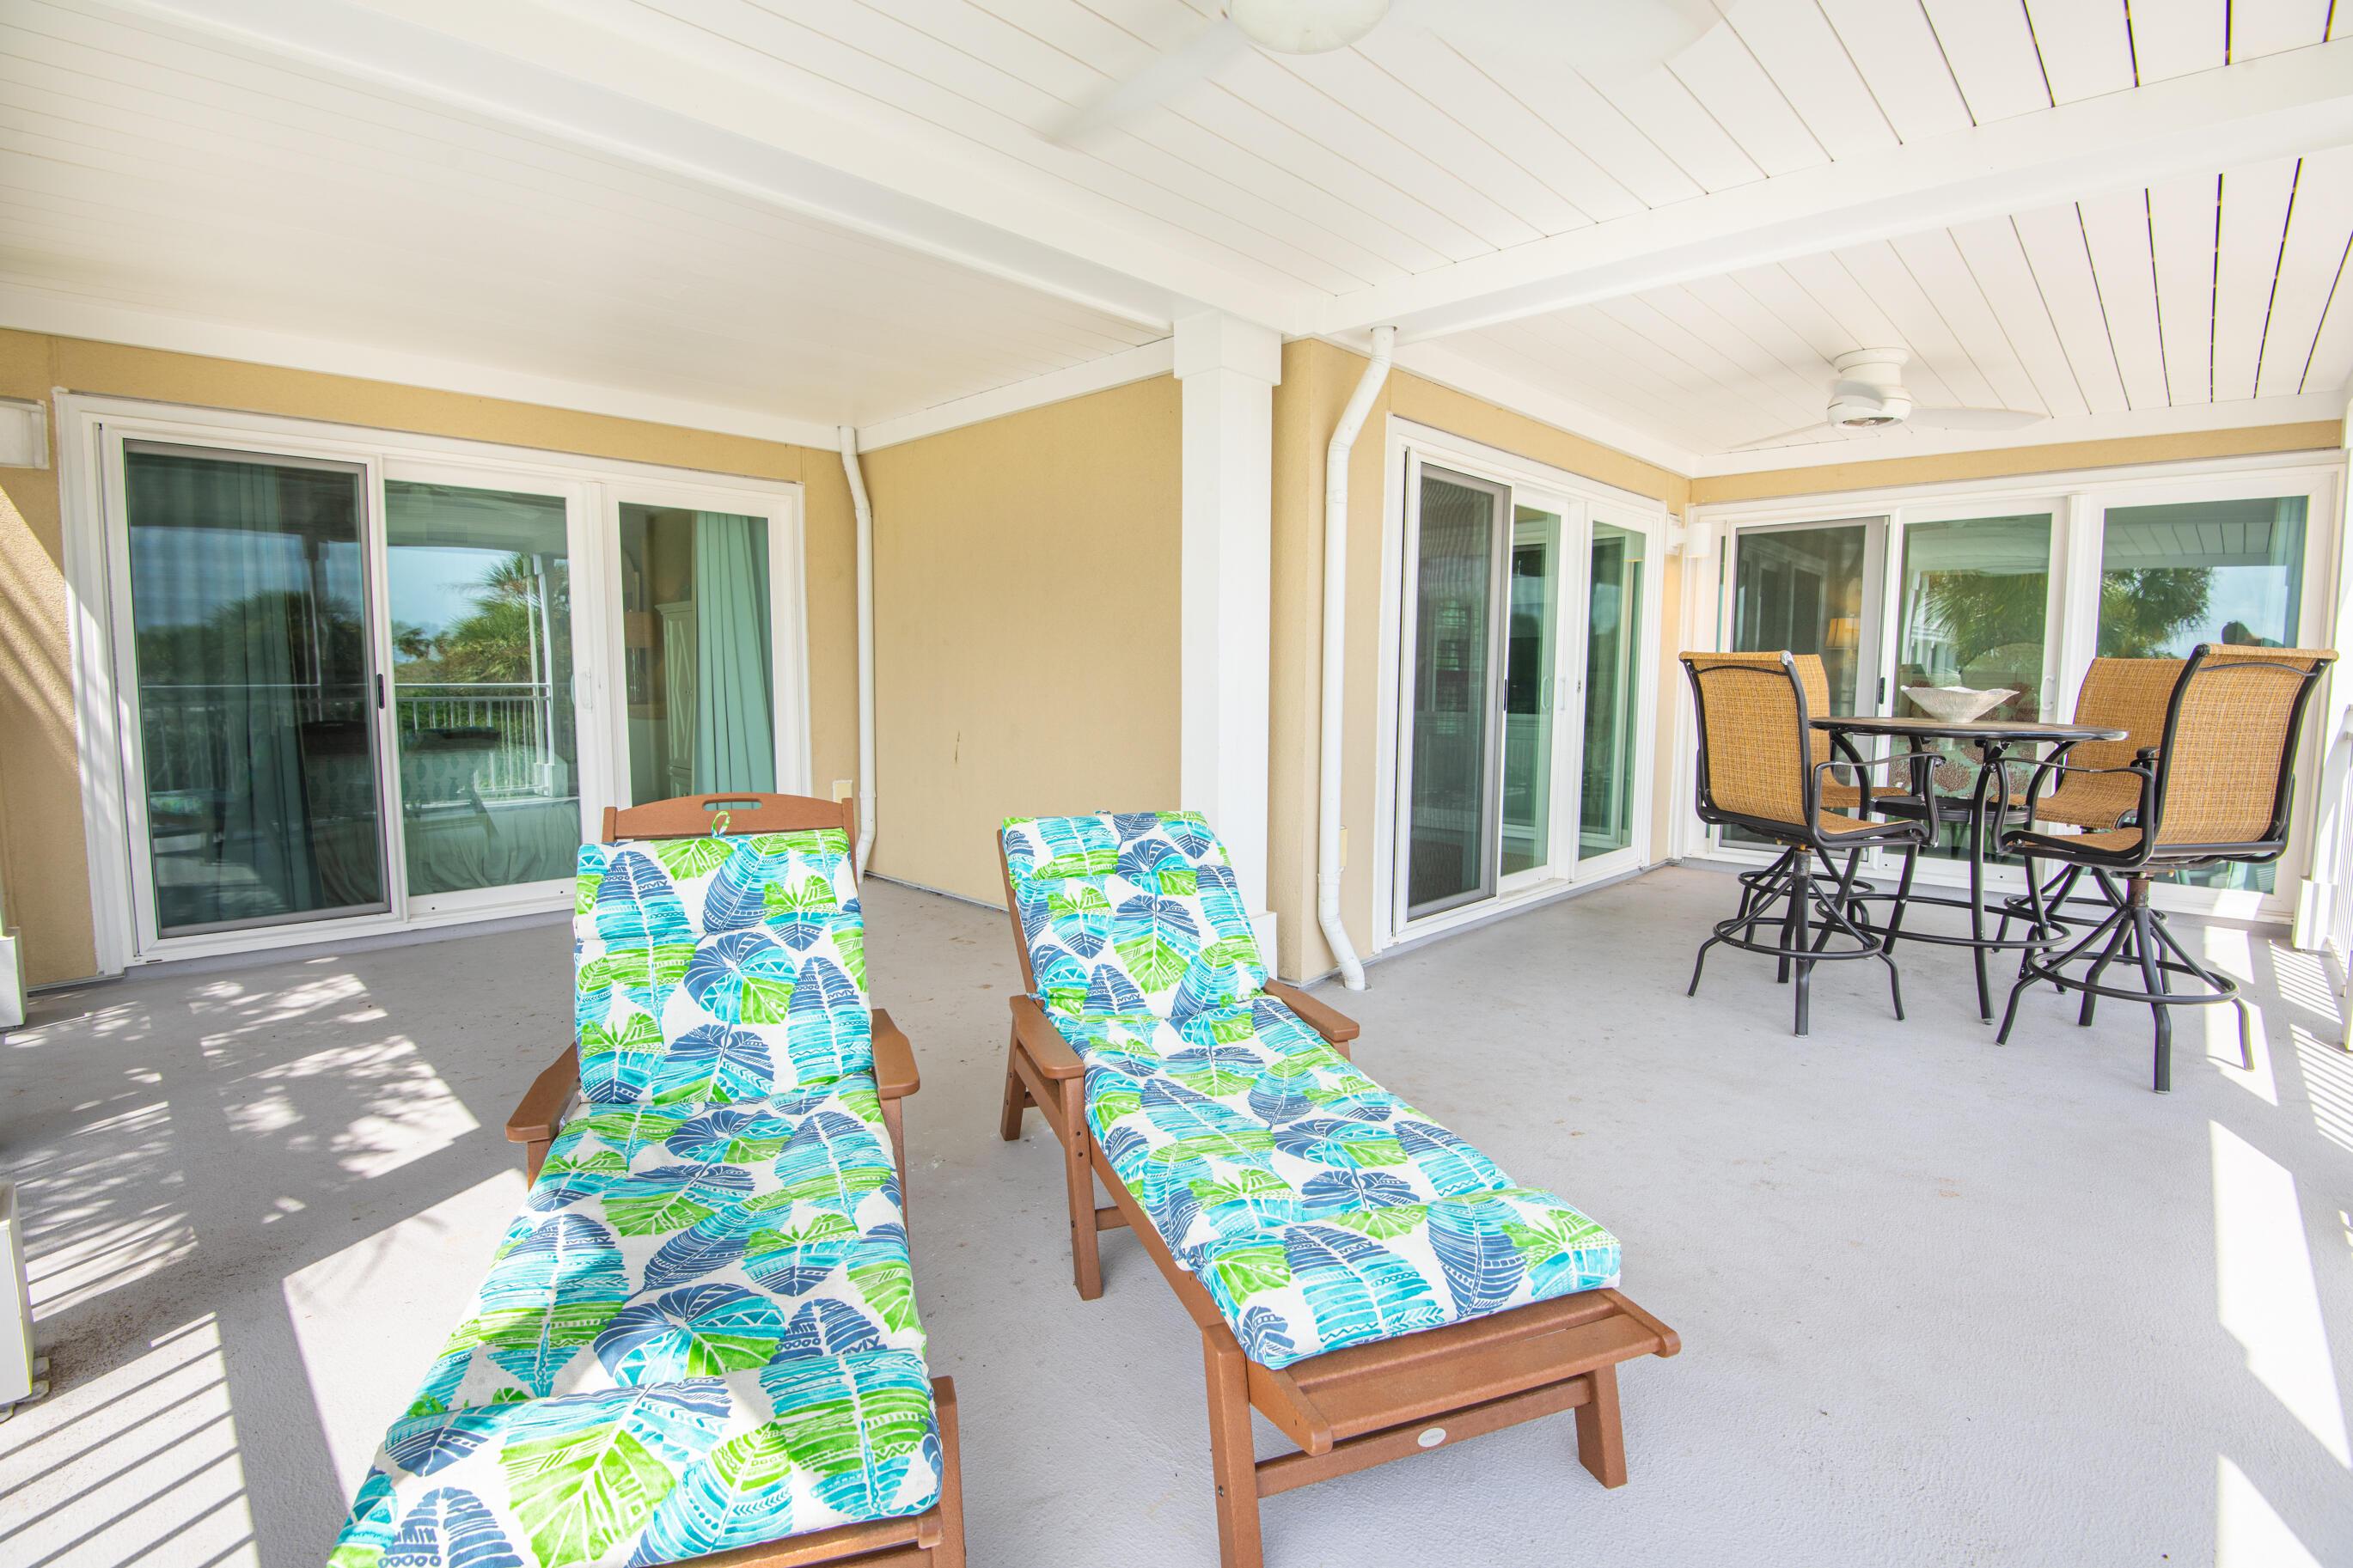 Atrium Villas Homes For Sale - 2935 Atrium Villa, Seabrook Island, SC - 21